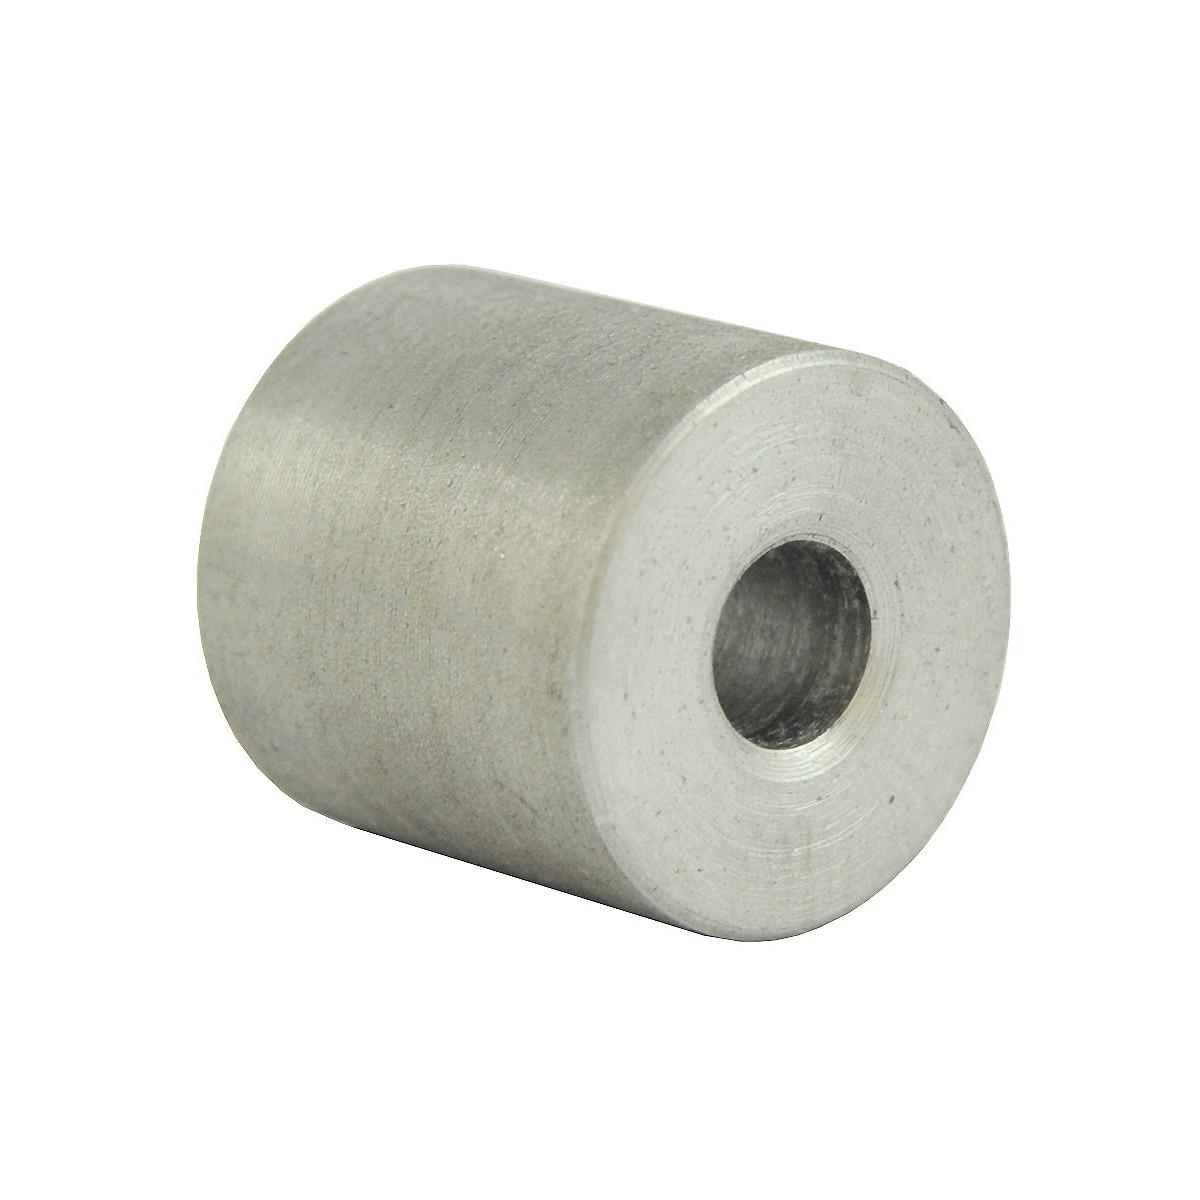 Sleeve bushing 8.5x24x24.5 mm ring